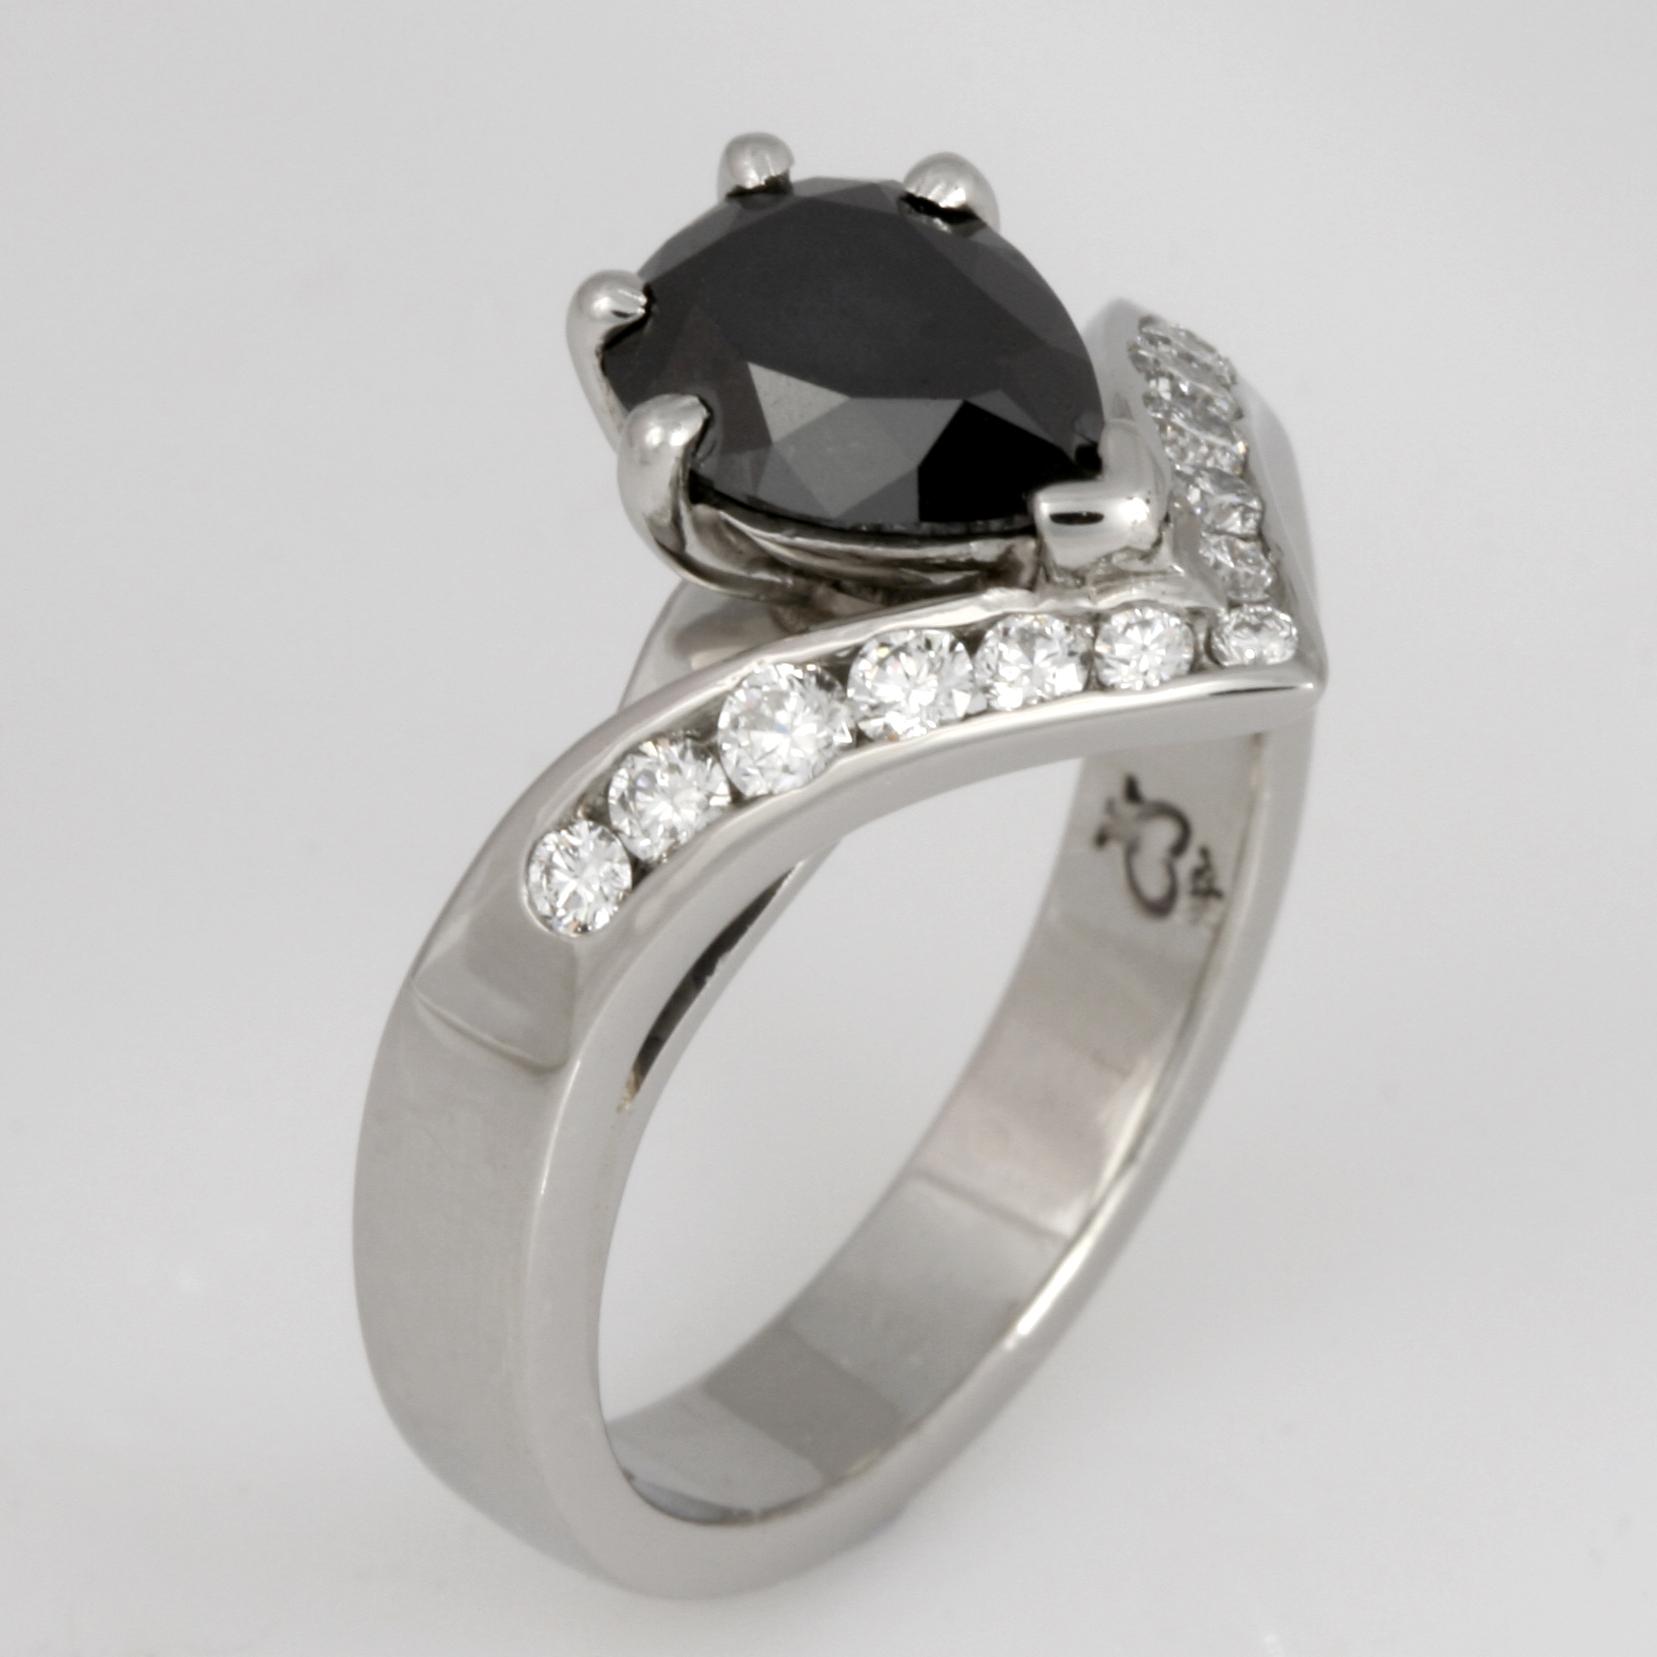 Handmade ladies palladium pear shape black diamond and round white diamond engagement ring